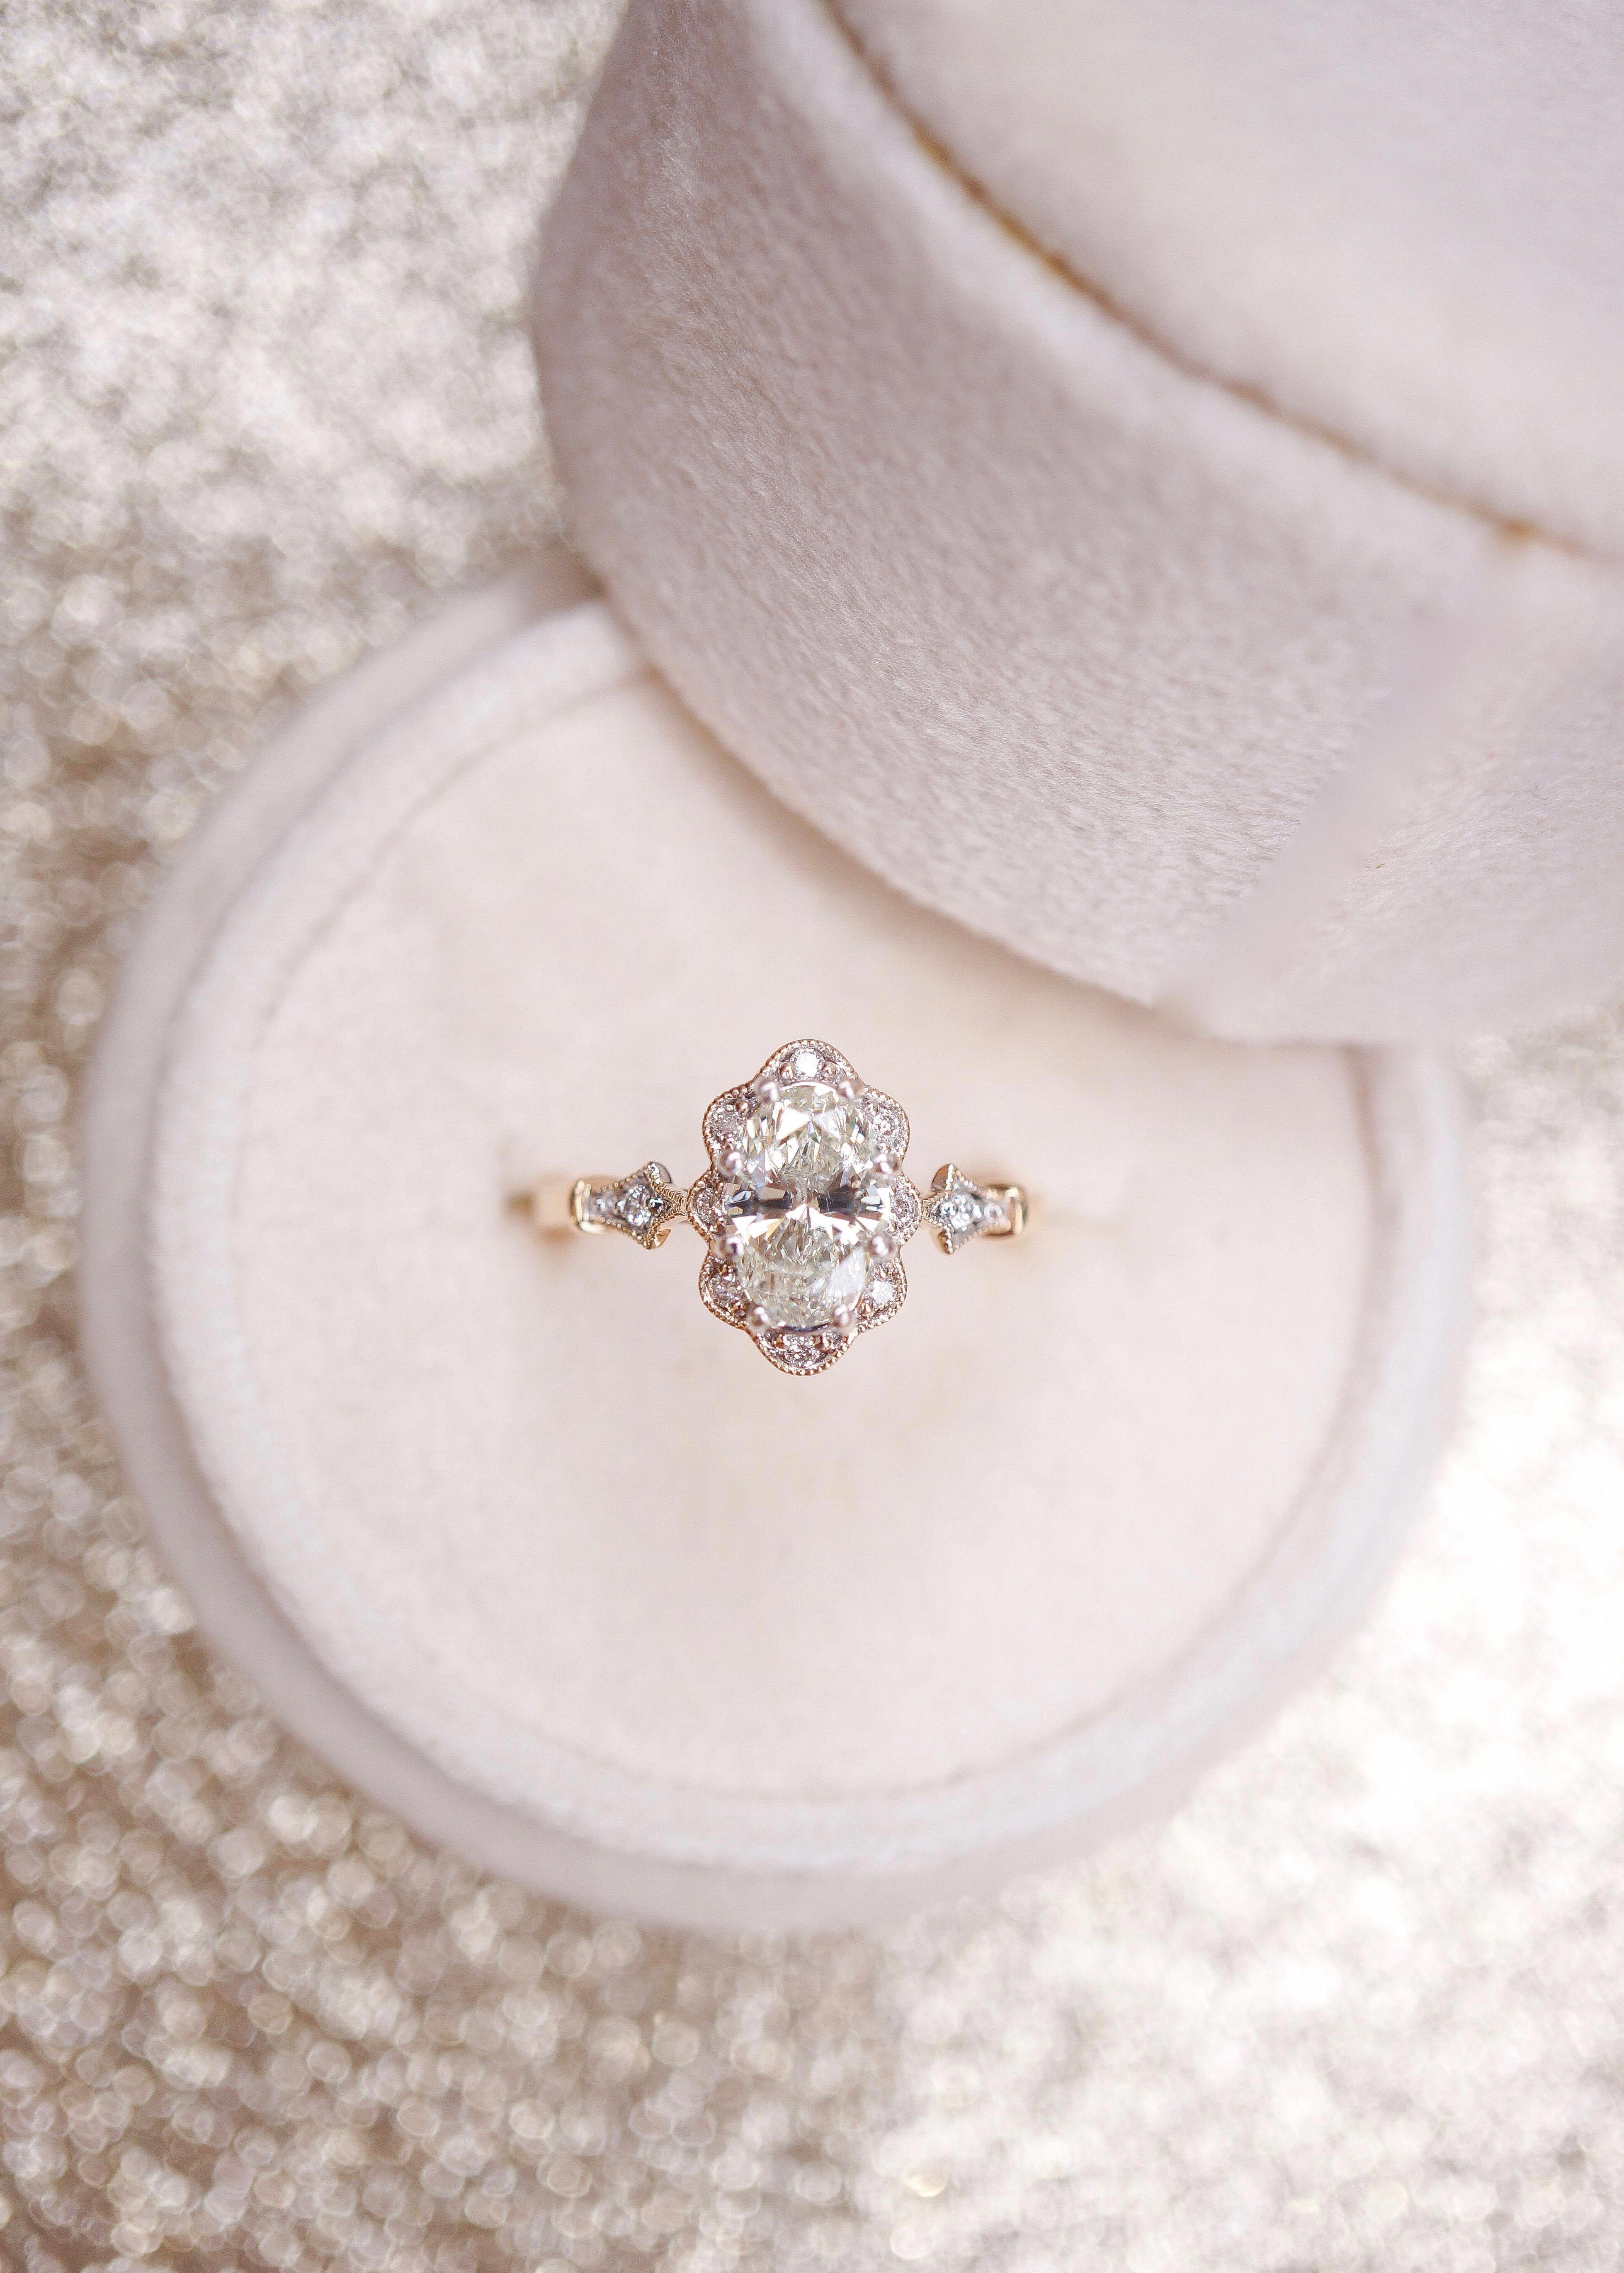 Gorgeous Halo Engagement Rings Haloengagementrings Oval Diamond